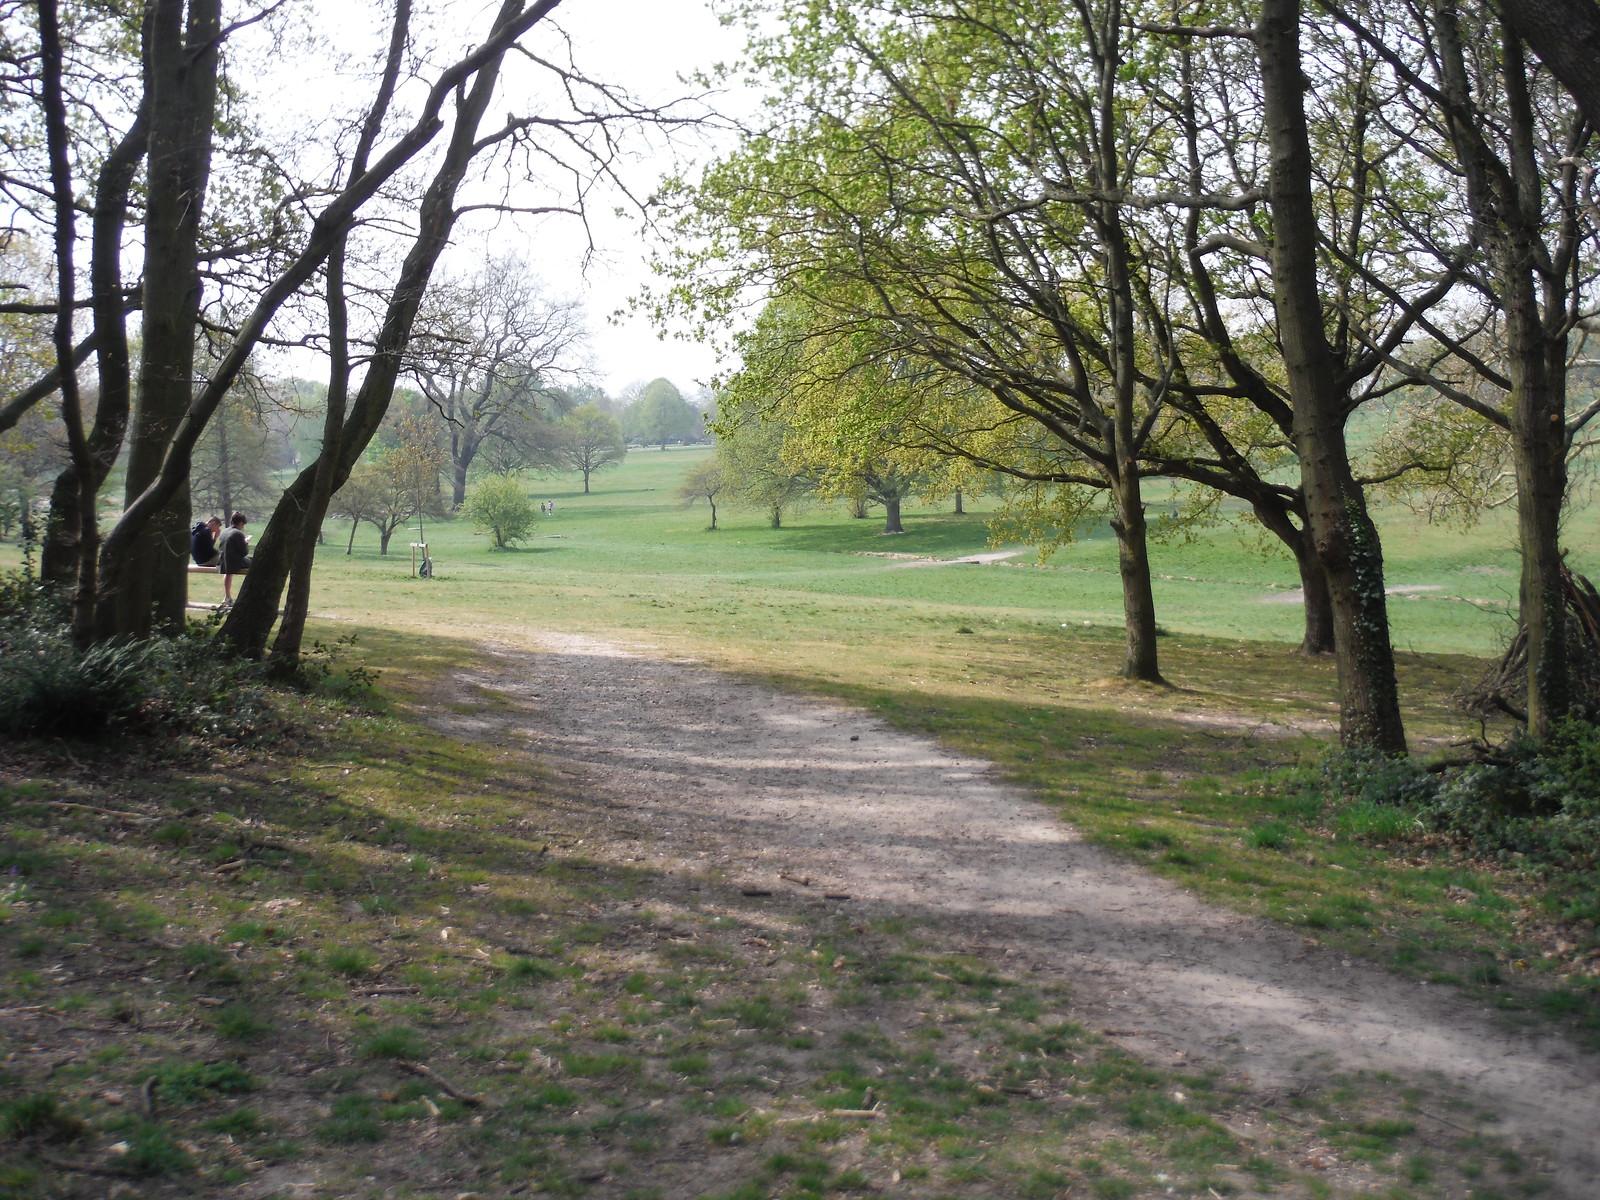 Vista SWC Short Walk 46 - Beckenham Place Park (Ravensbourne to Beckenham Hill)